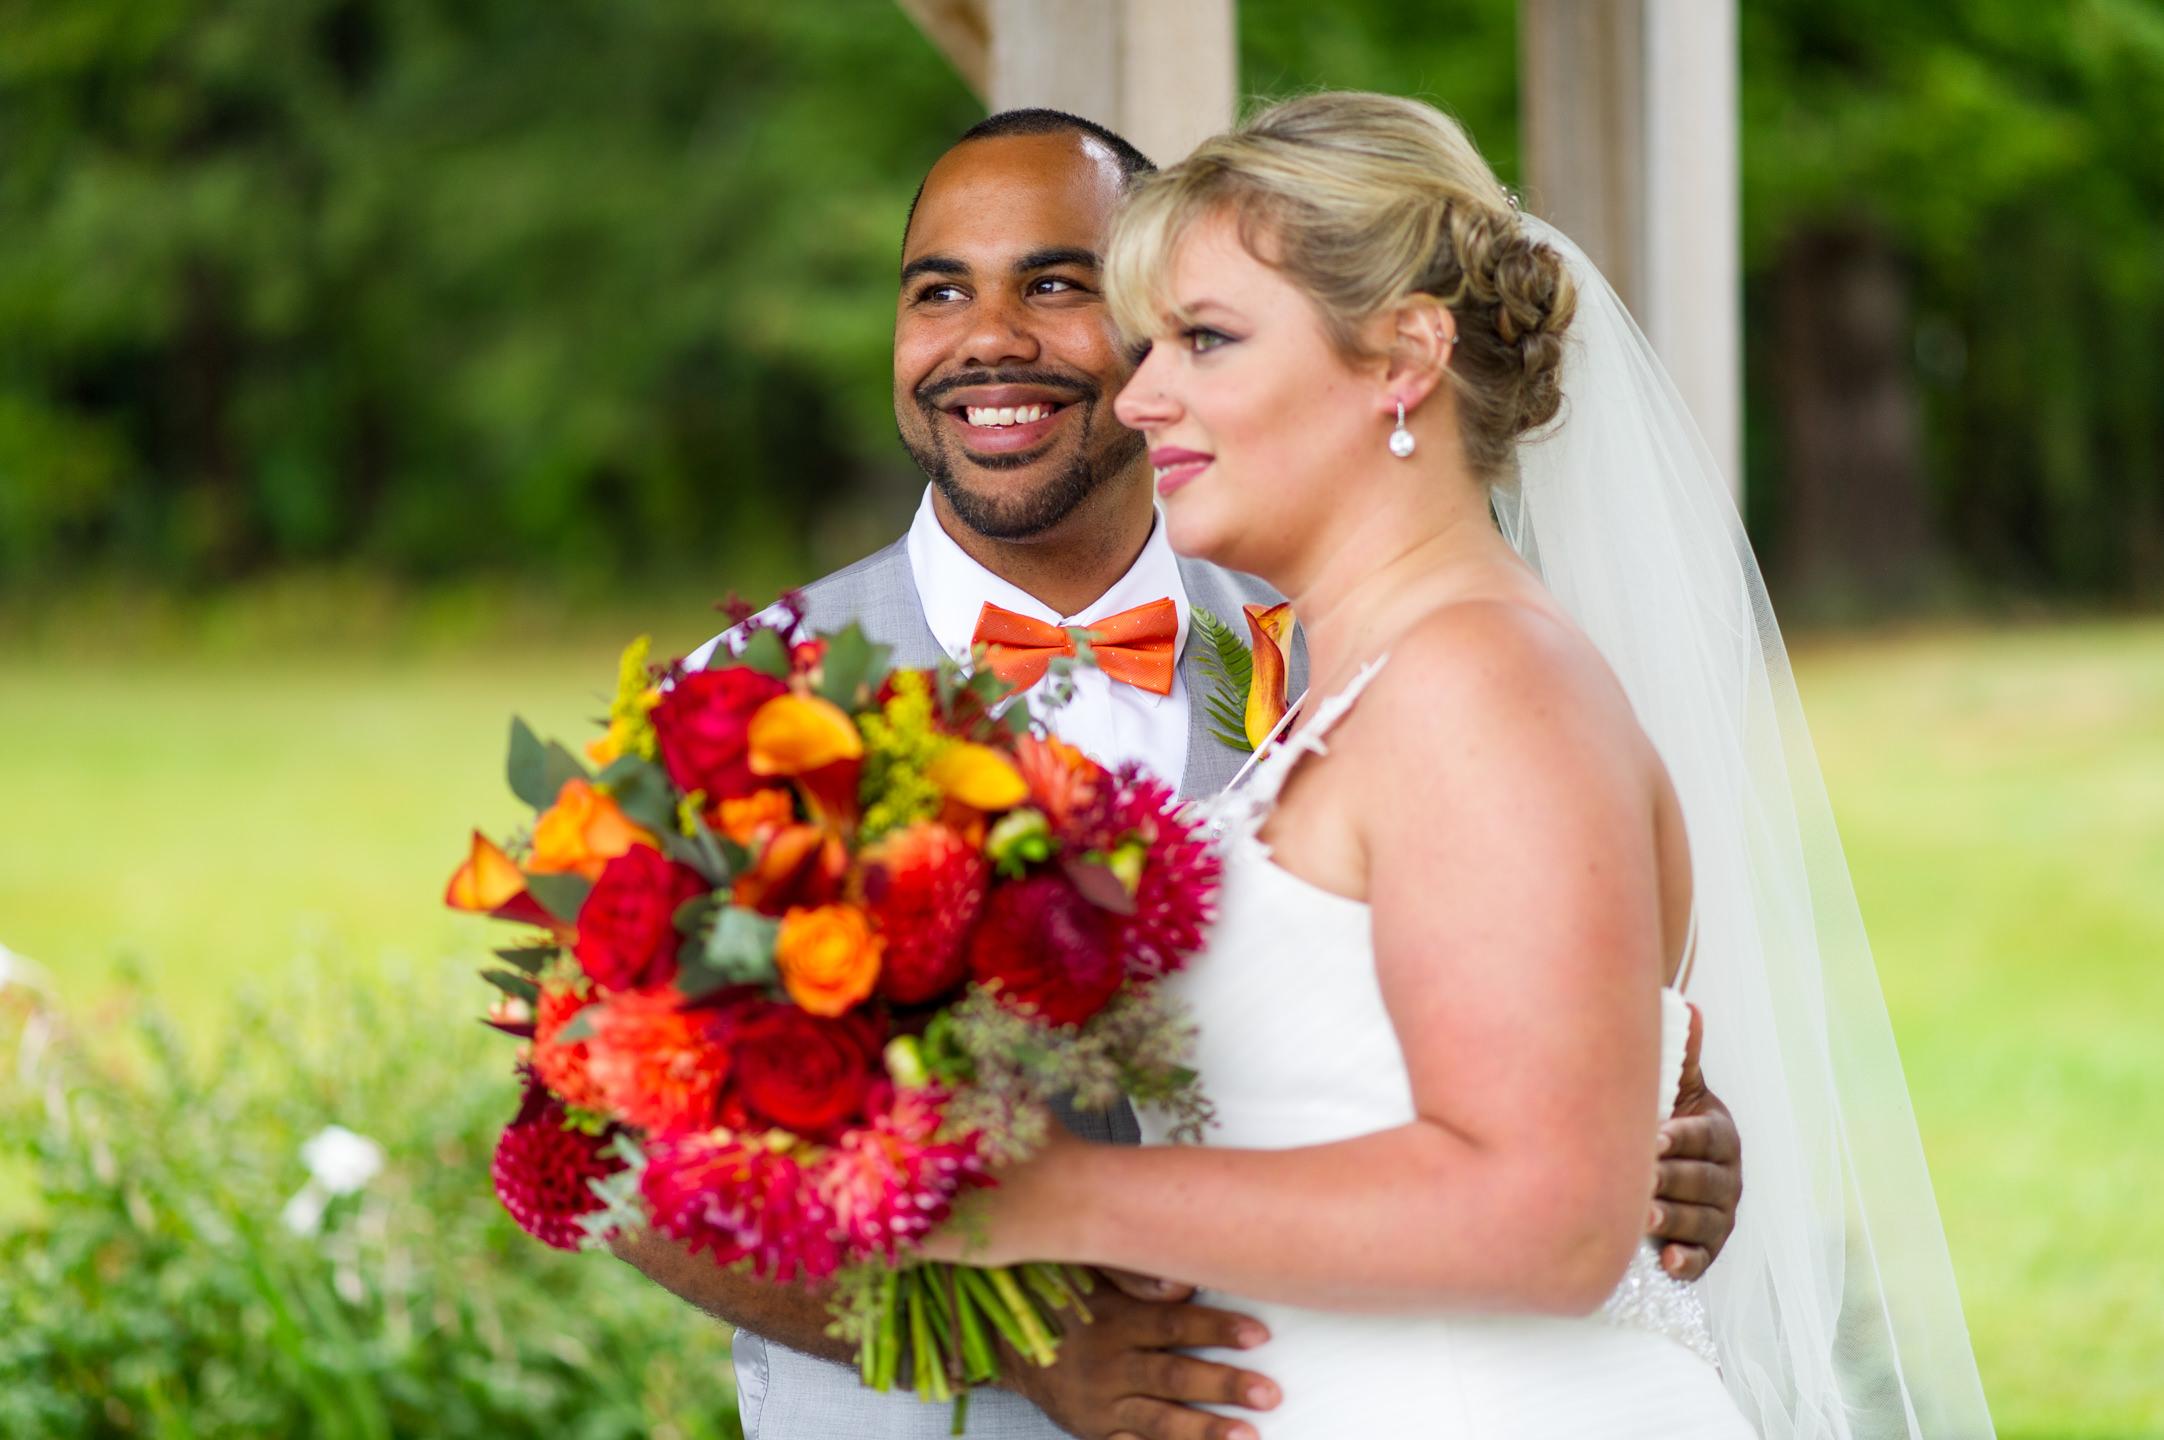 20160917_Tat_Renee and Marcus Wedding-22.jpg